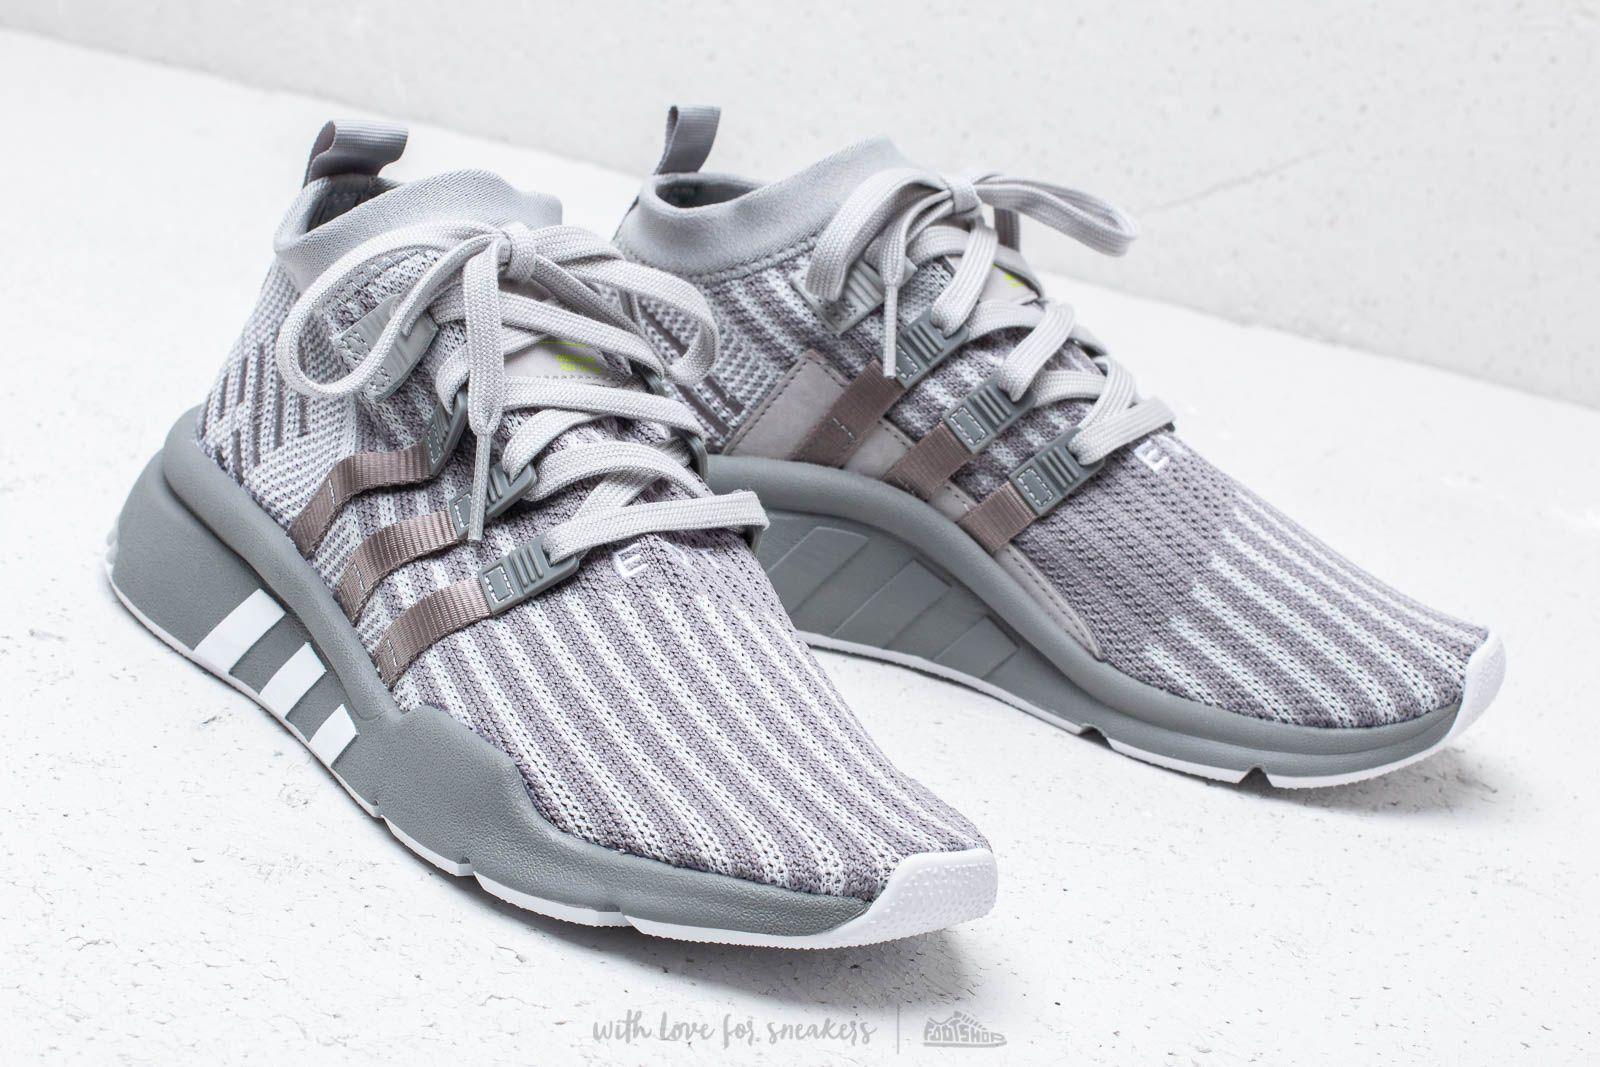 5ac8904f3fb2 Lyst - adidas Originals Adidas Eqt Support Mid Adv Primeknit Grey ...